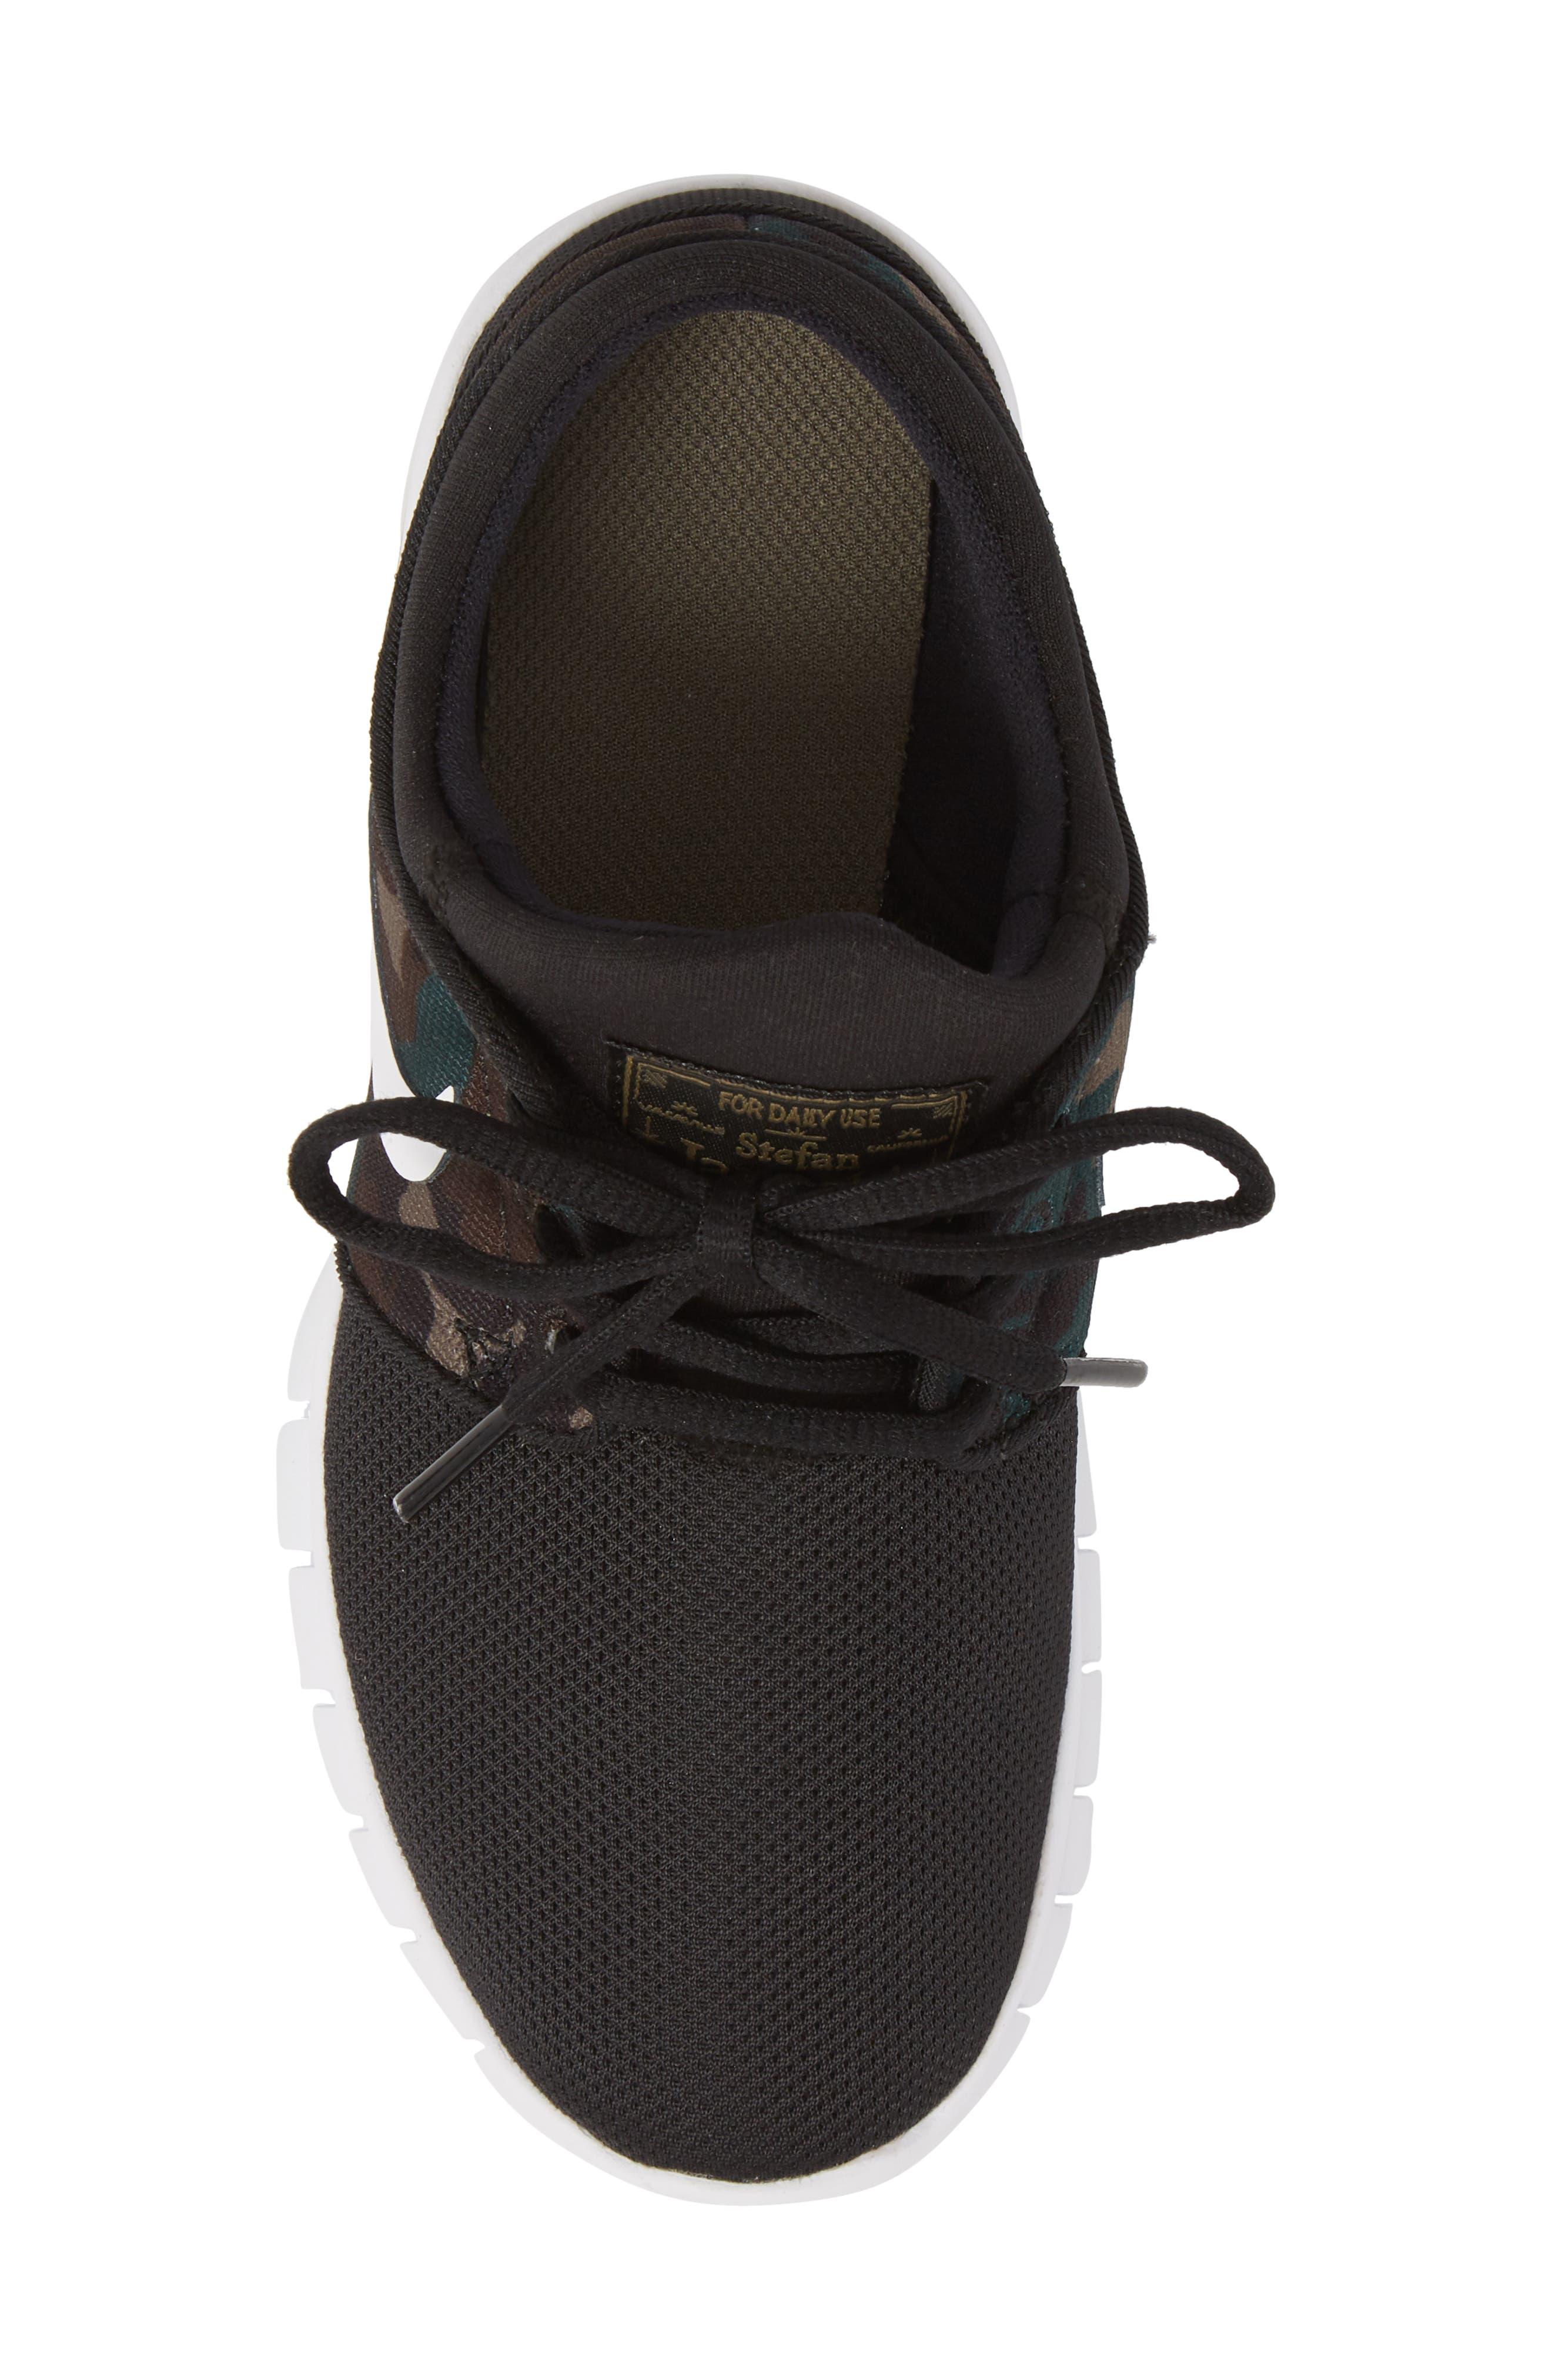 Stefan Janoski Max SB Skate Sneaker,                             Alternate thumbnail 5, color,                             Black/ White/ Olive/ Brown